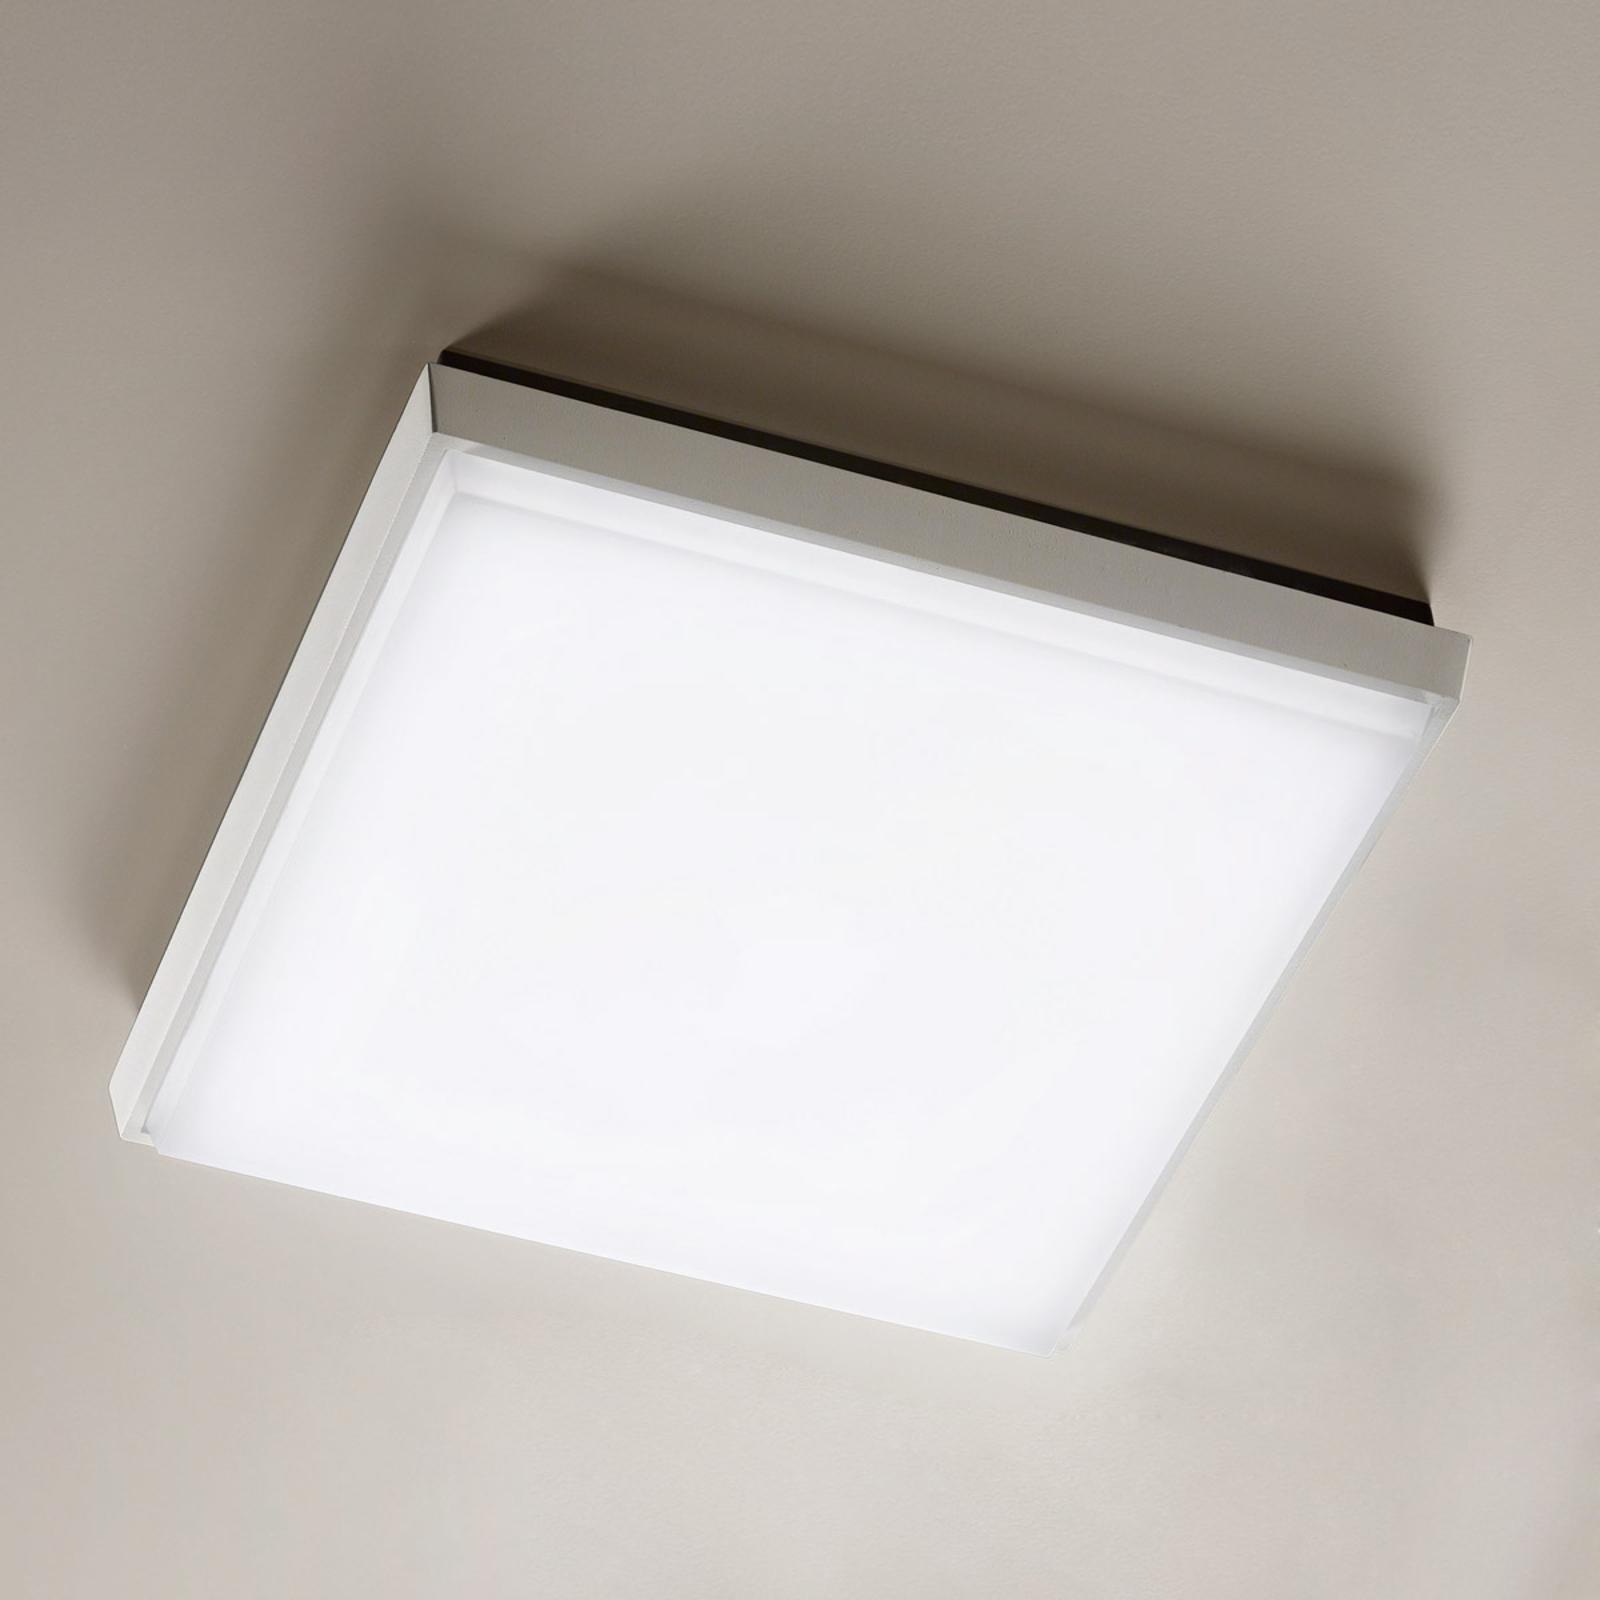 Kantig LED-utomhustaklampa Desdy